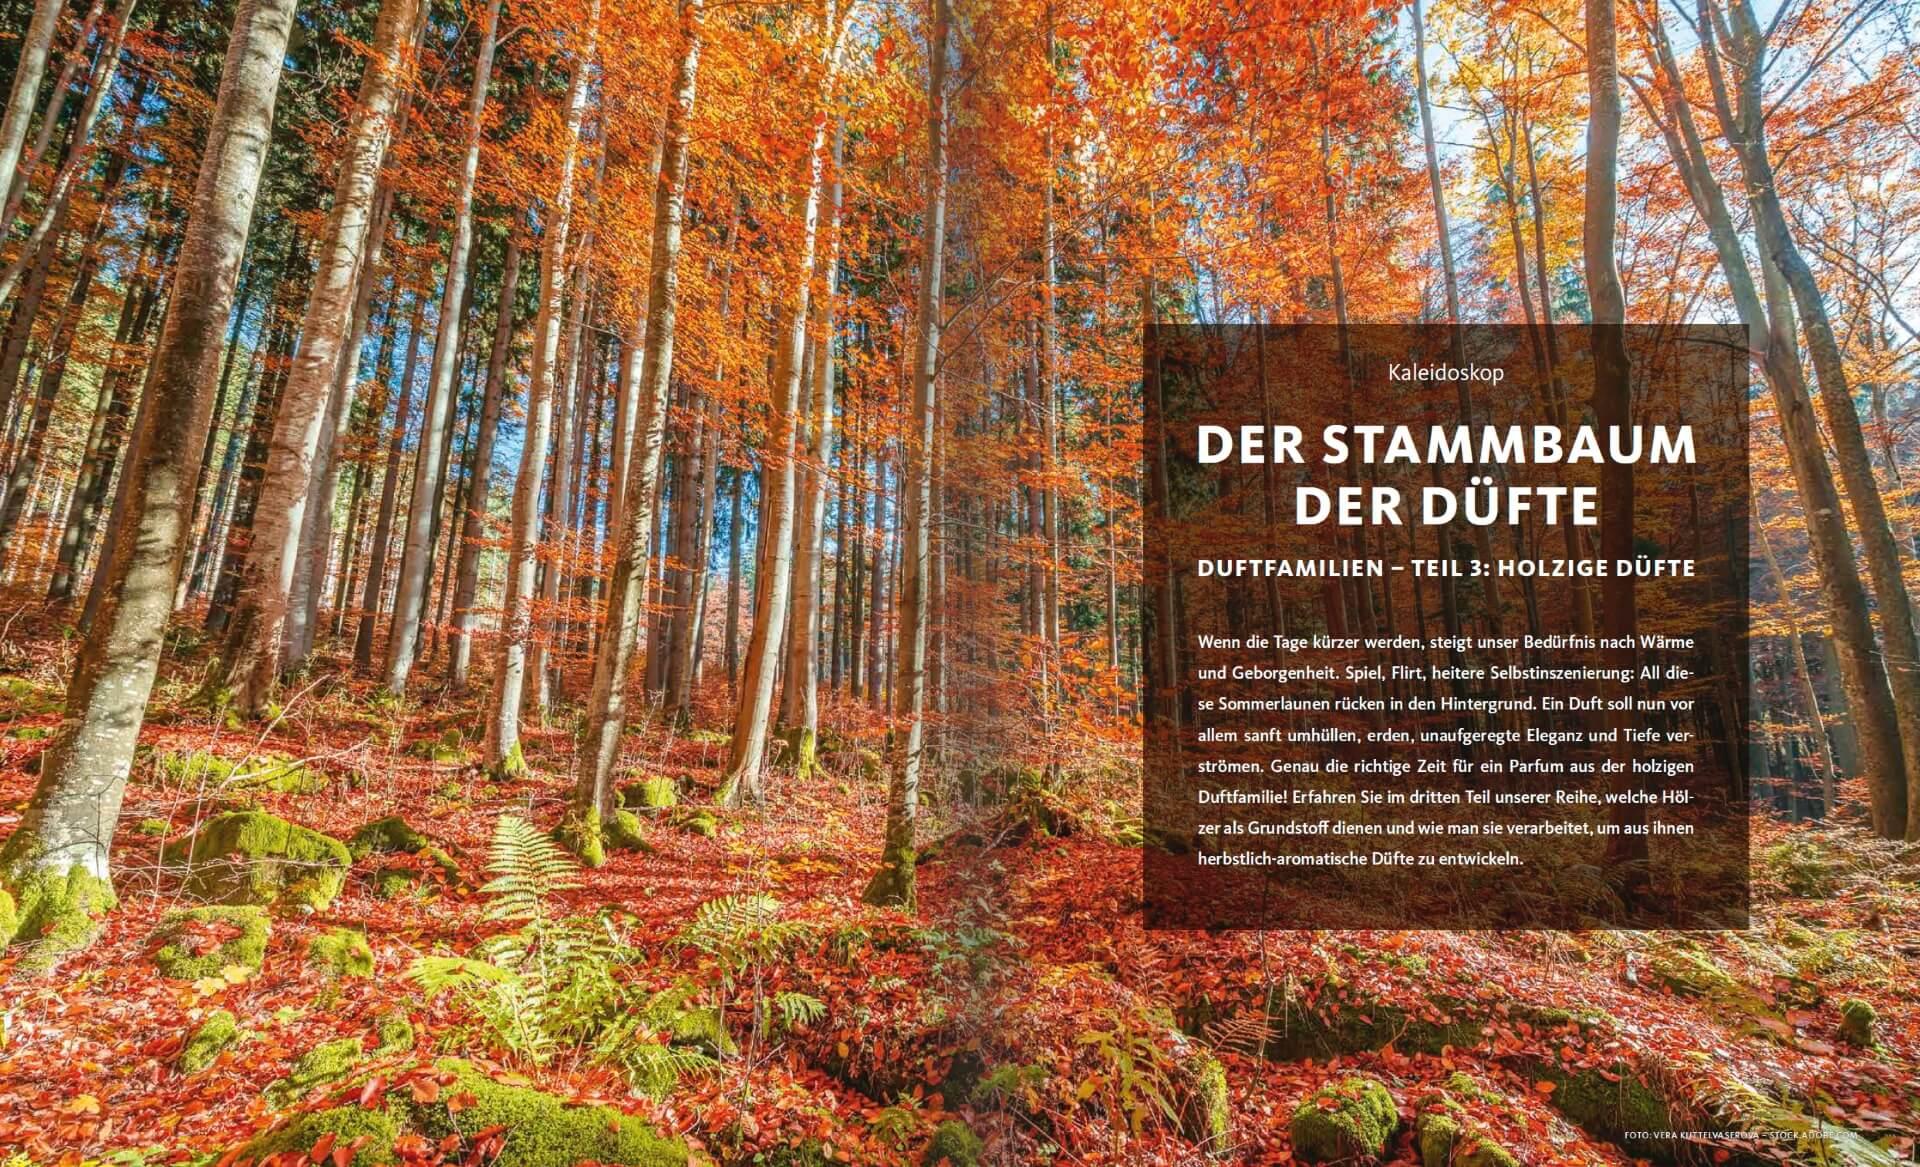 GARTENDESIGN INSPIRATION Ausgabe 5/2018: Holzige Düfte